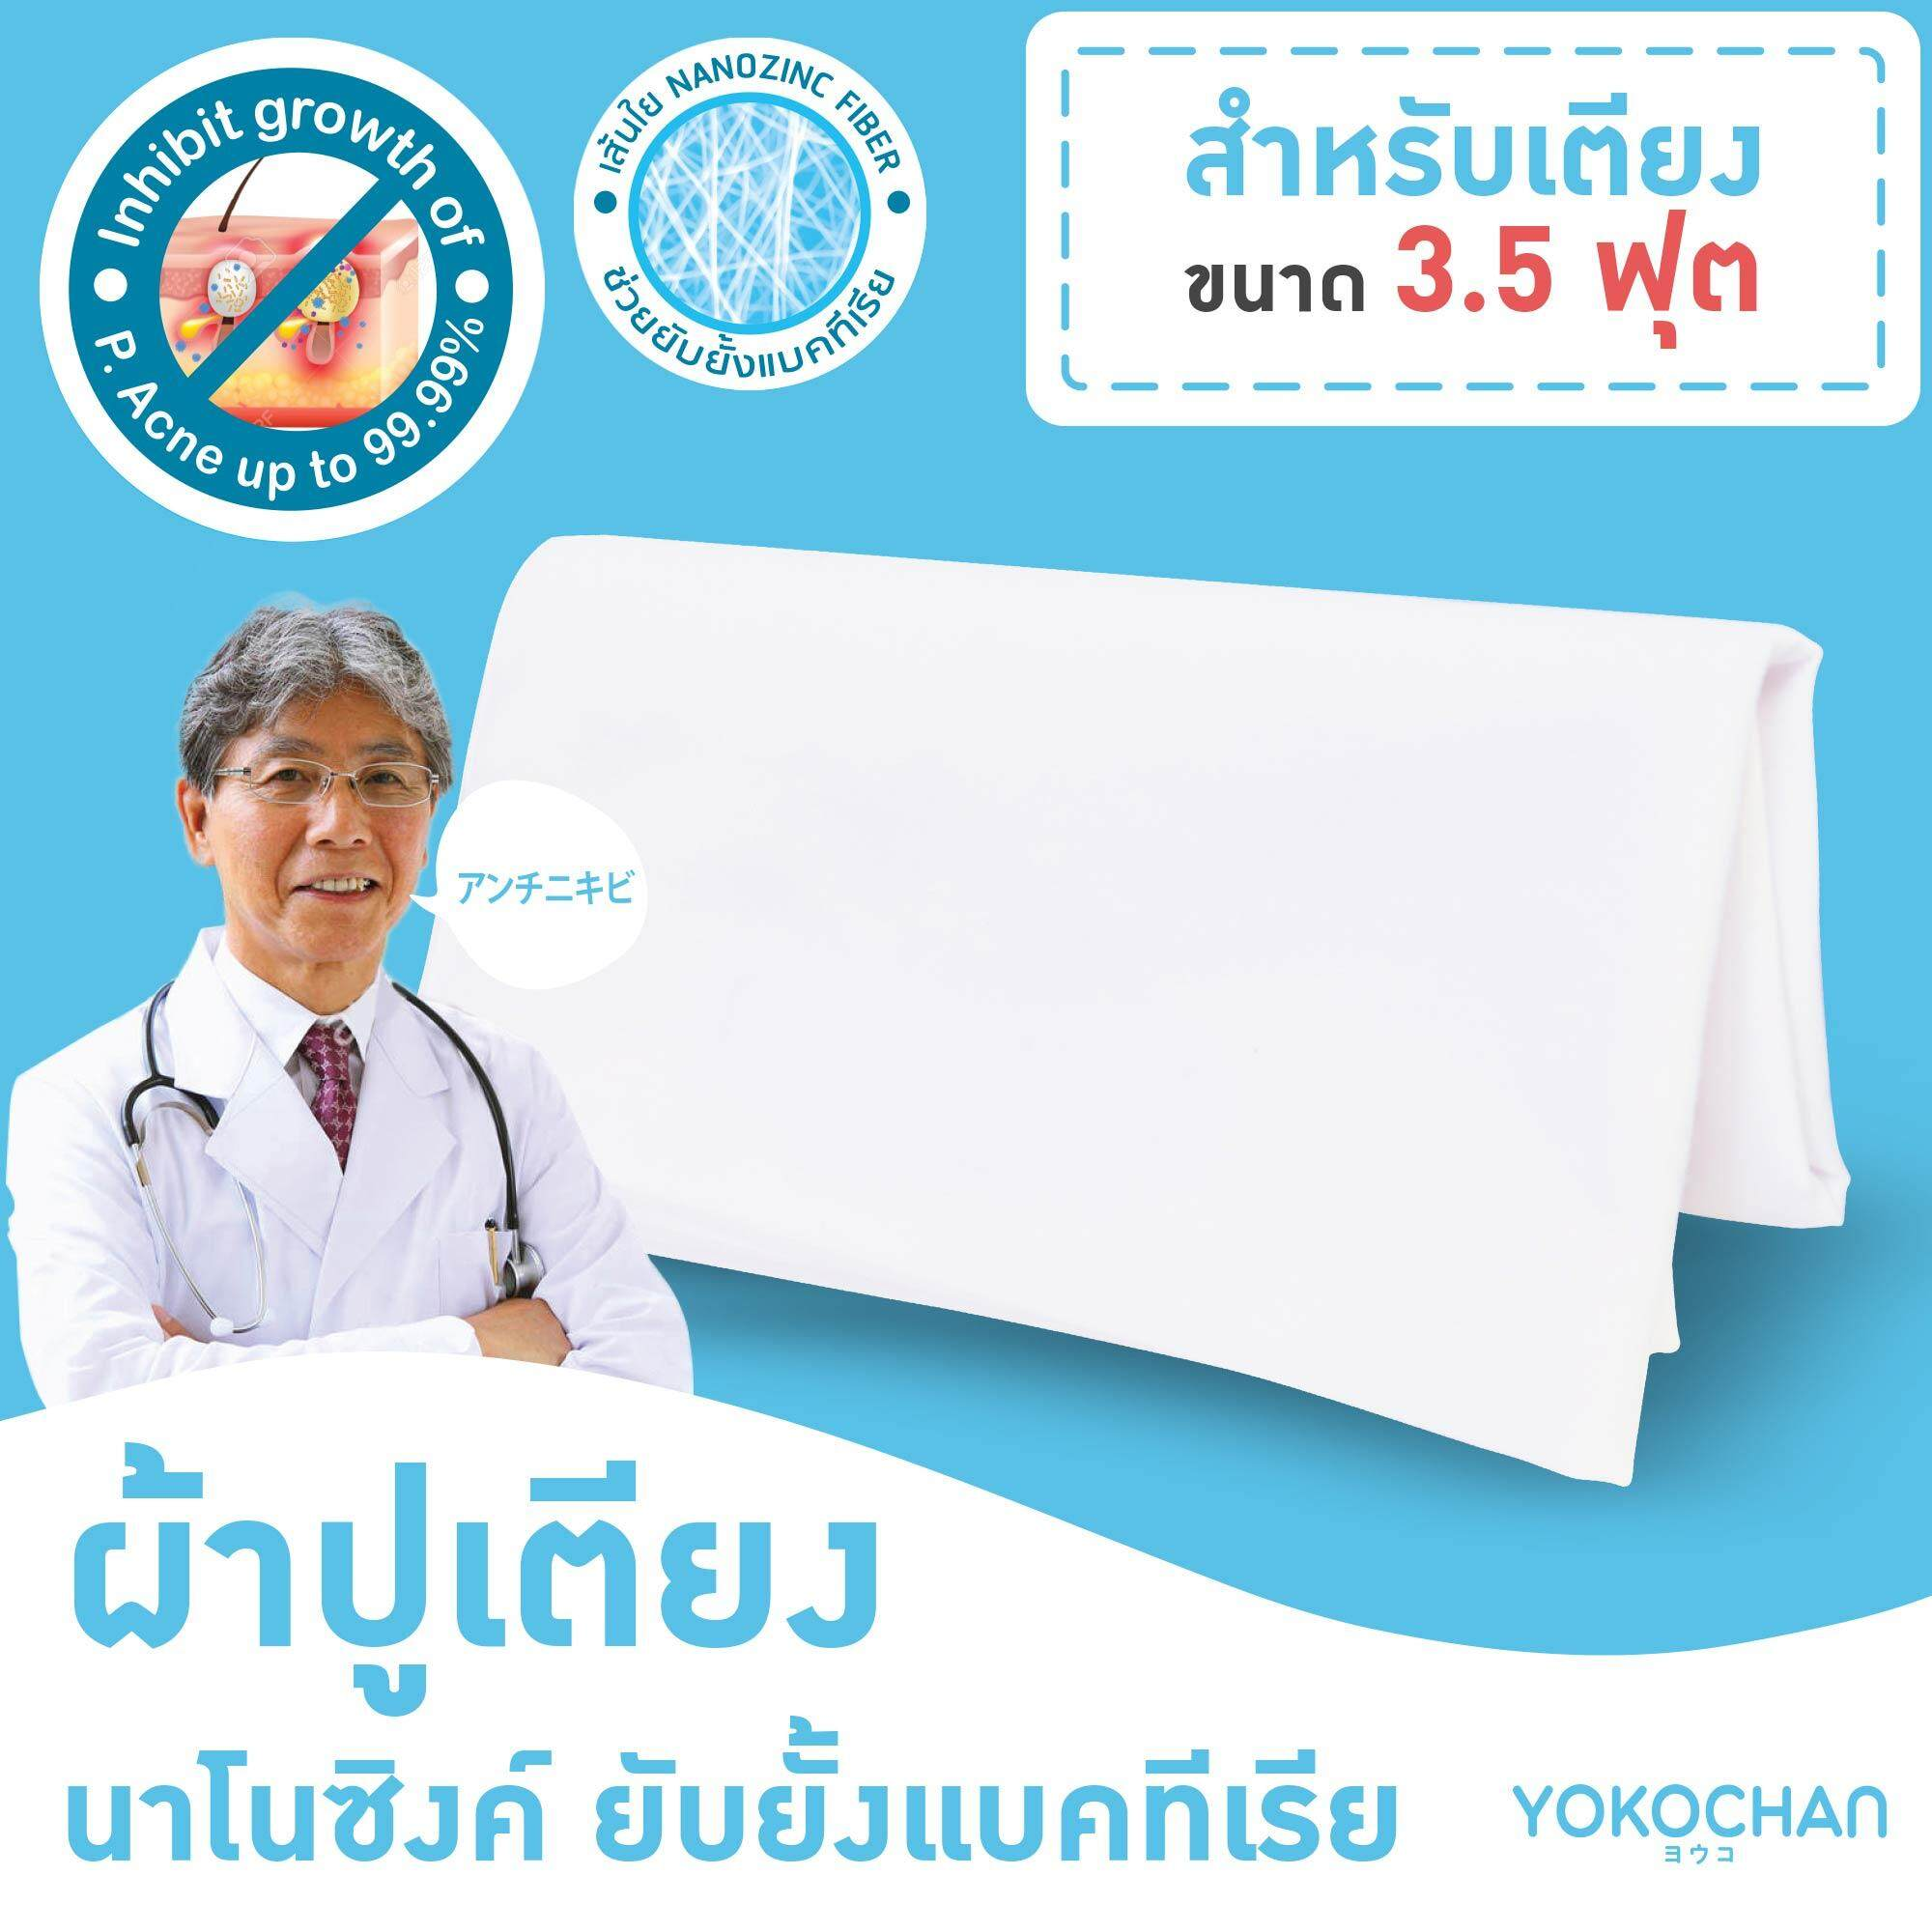 Yokochan ผ้าปูเตียงNanoZinc ยับยั้งแบคทีเรีย กันไรฝุ่น ตรา โยโกะจัง - สำหรับเตียง 3.5 ฟุต YOKOCHAN anti-bacterial anti-dustmite NanoZinc Bed sheet for 3.5 ft bed